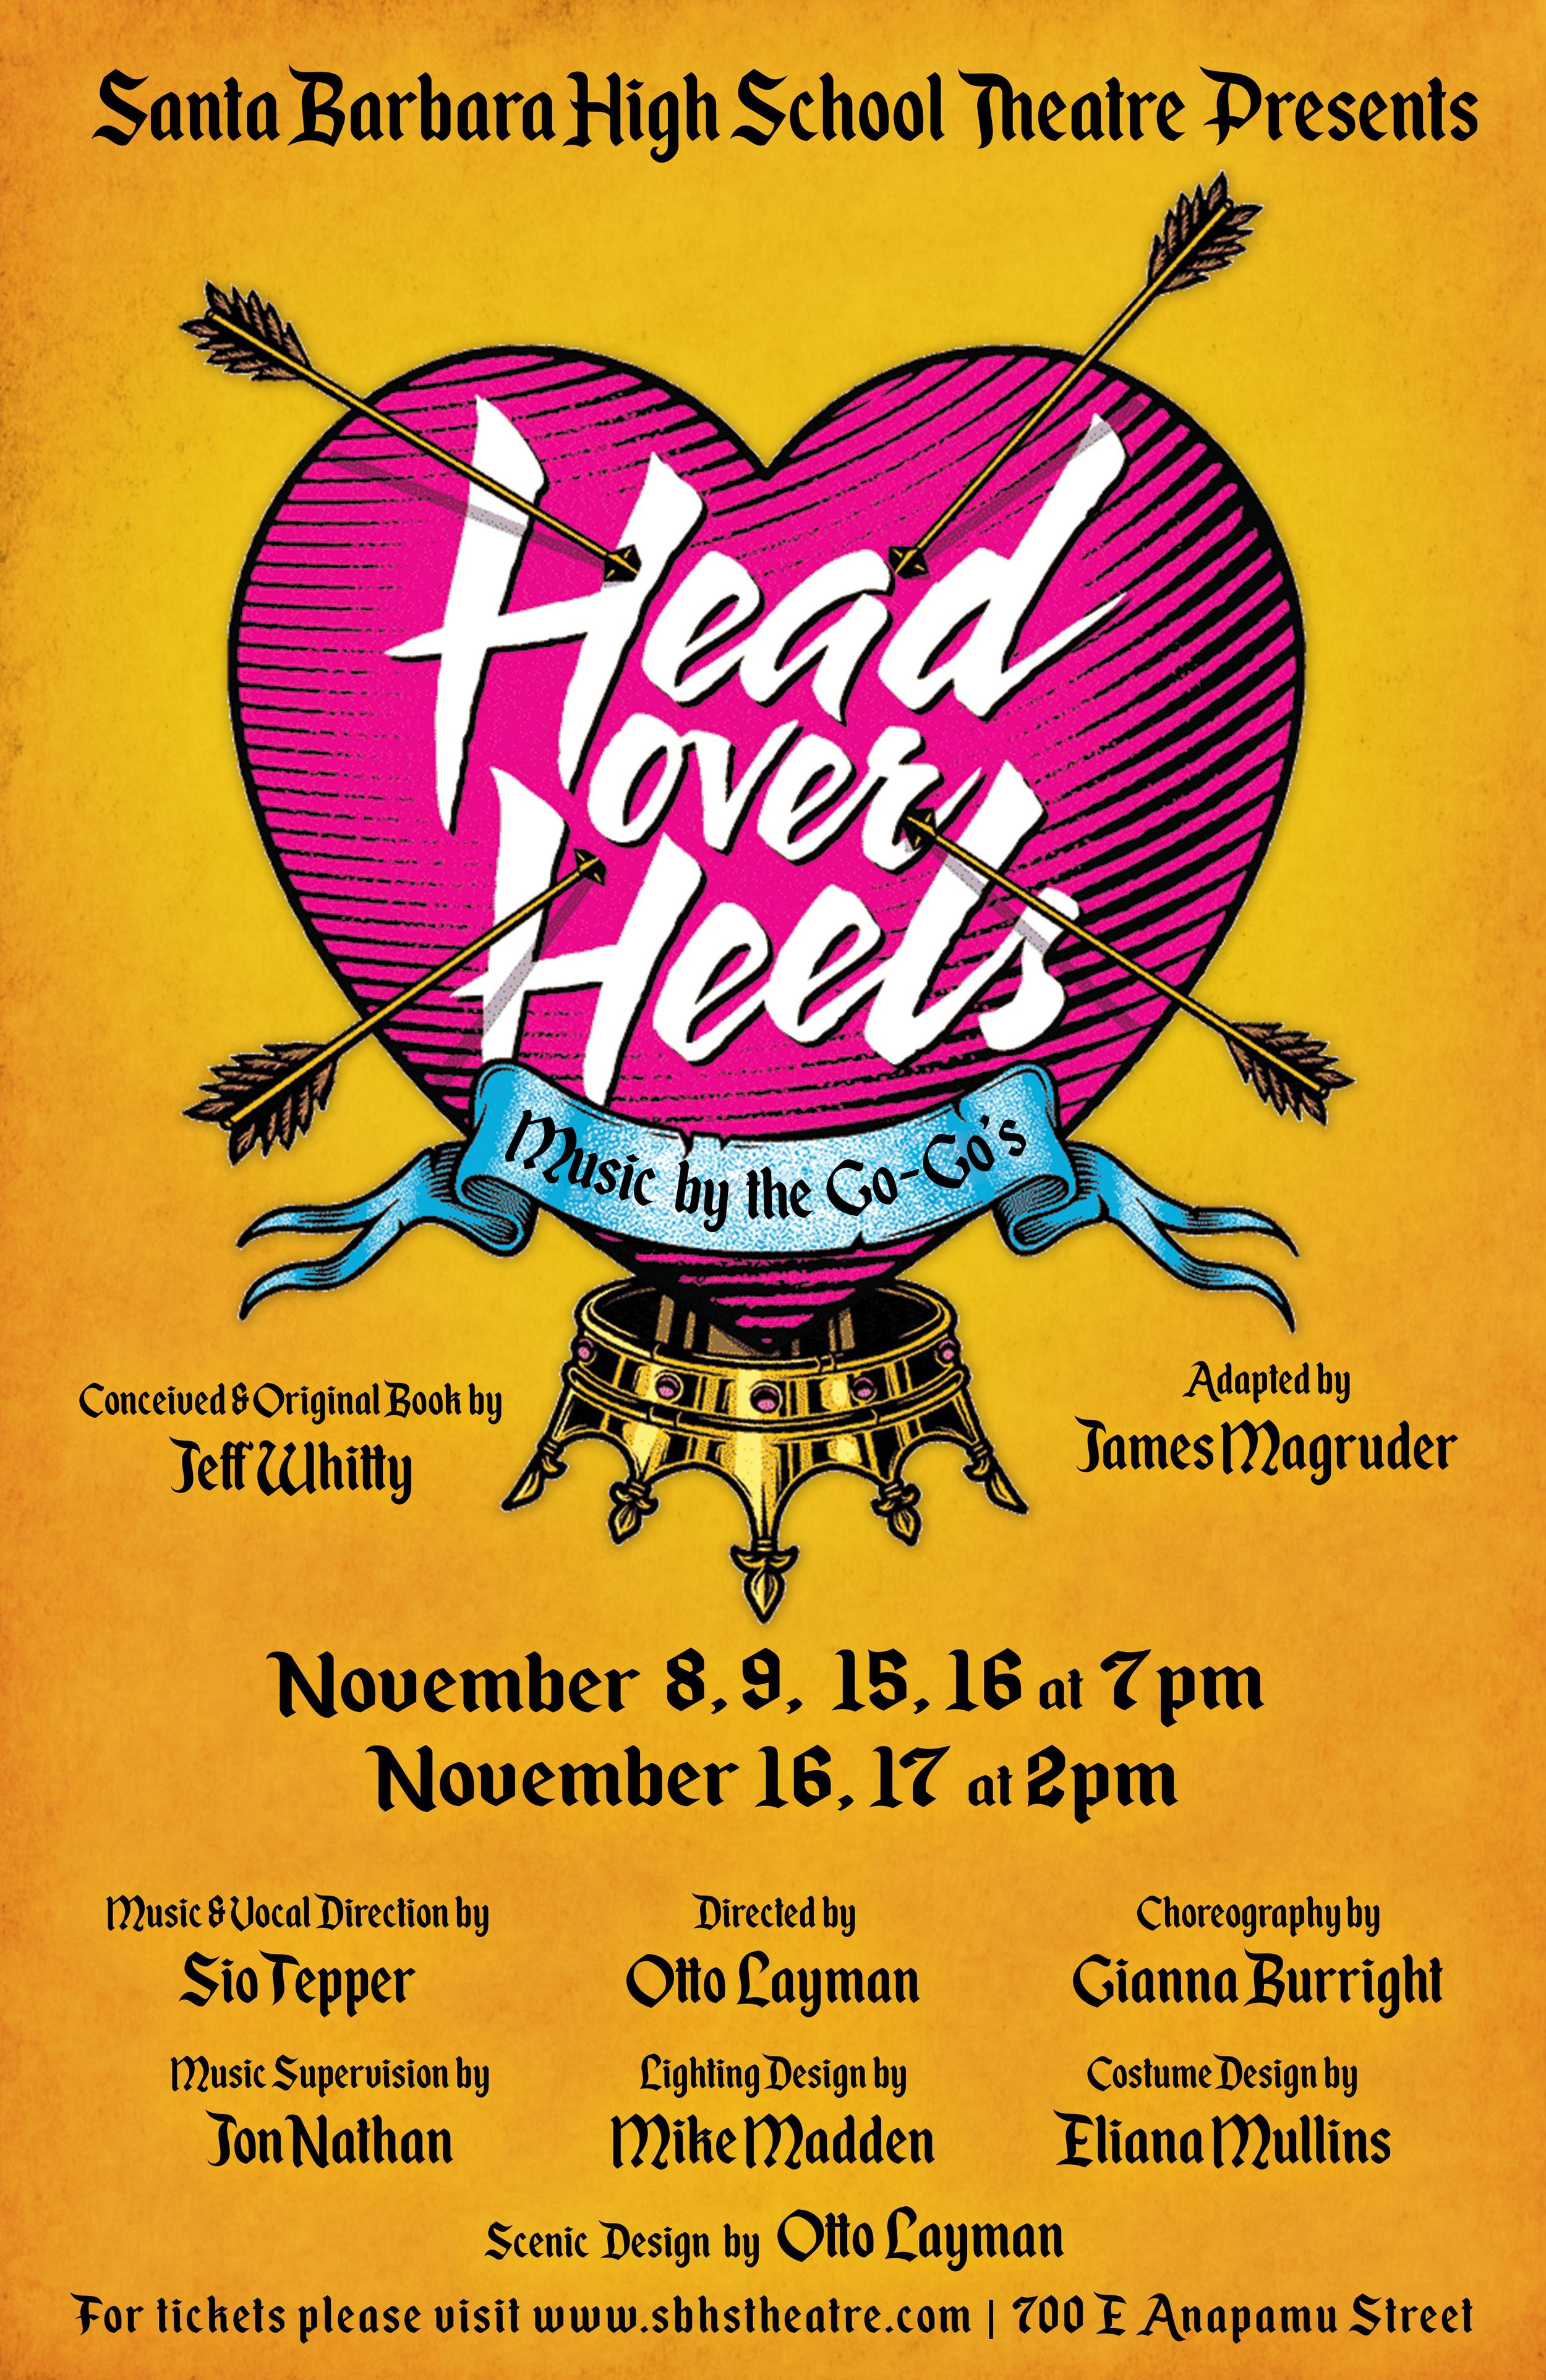 Head Over Heels at Santa Barbara High School, November 8th to 17th title=